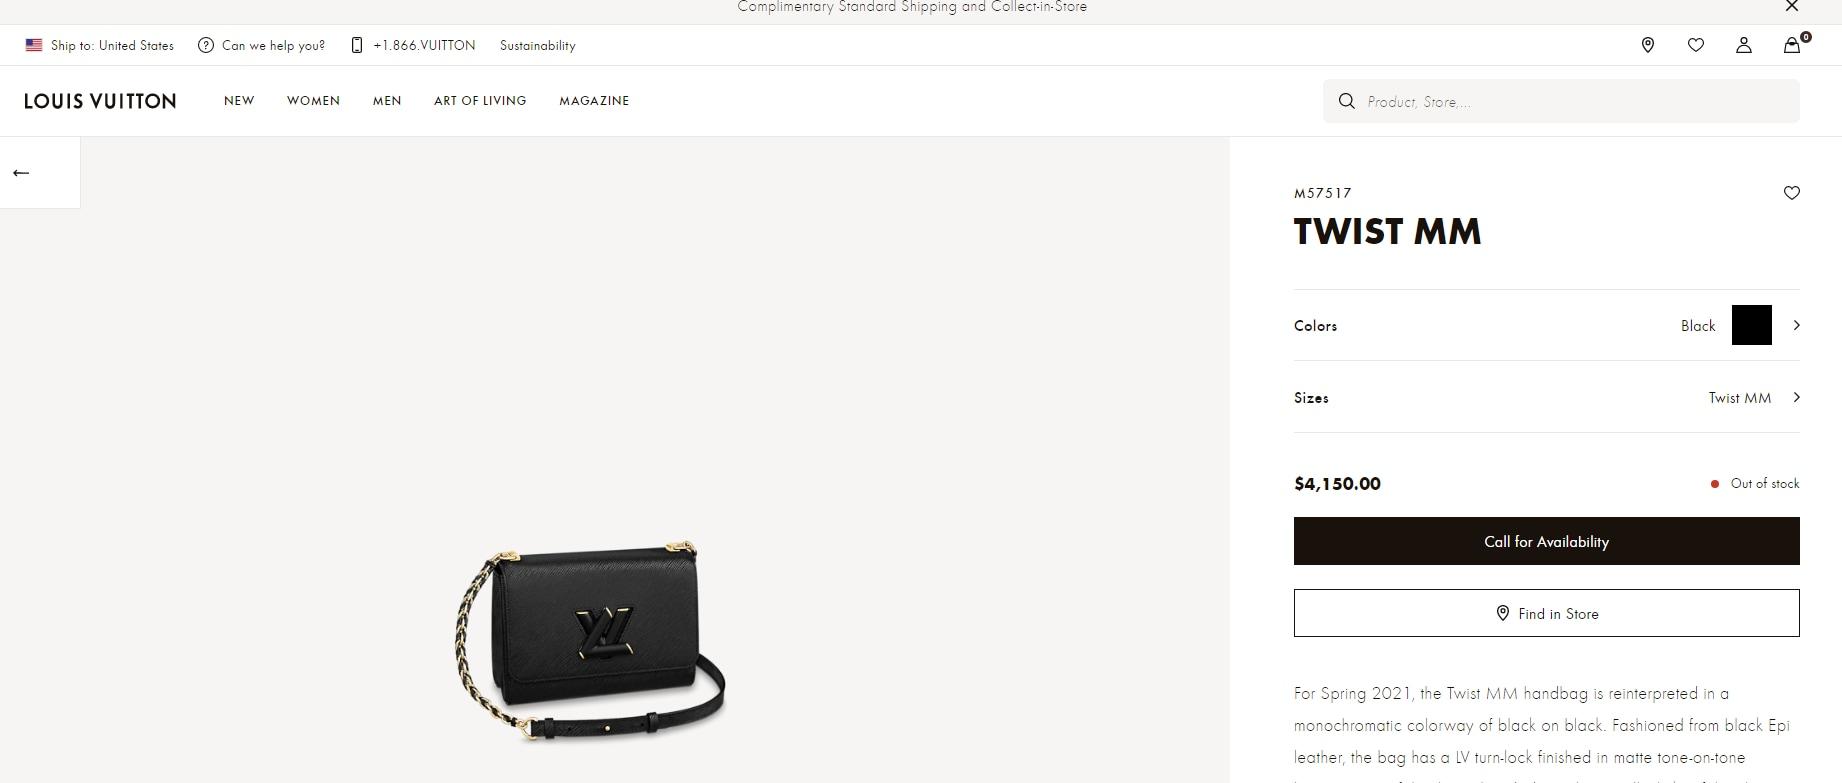 Natasa's bag is worth ₹3,04,108(us.louisvuitton.com)